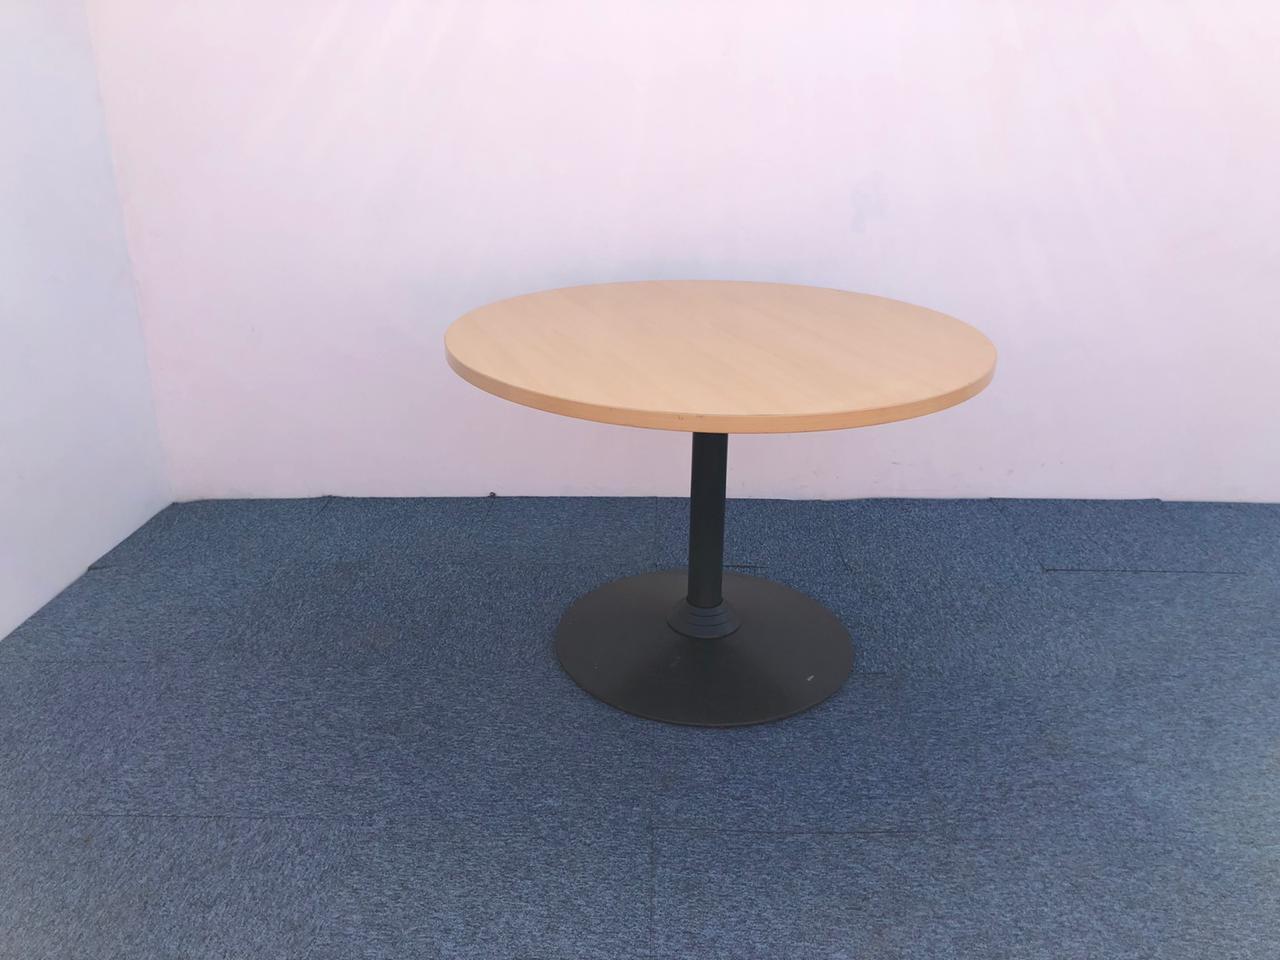 Table ronde Steelcase couleur hetre 100cm